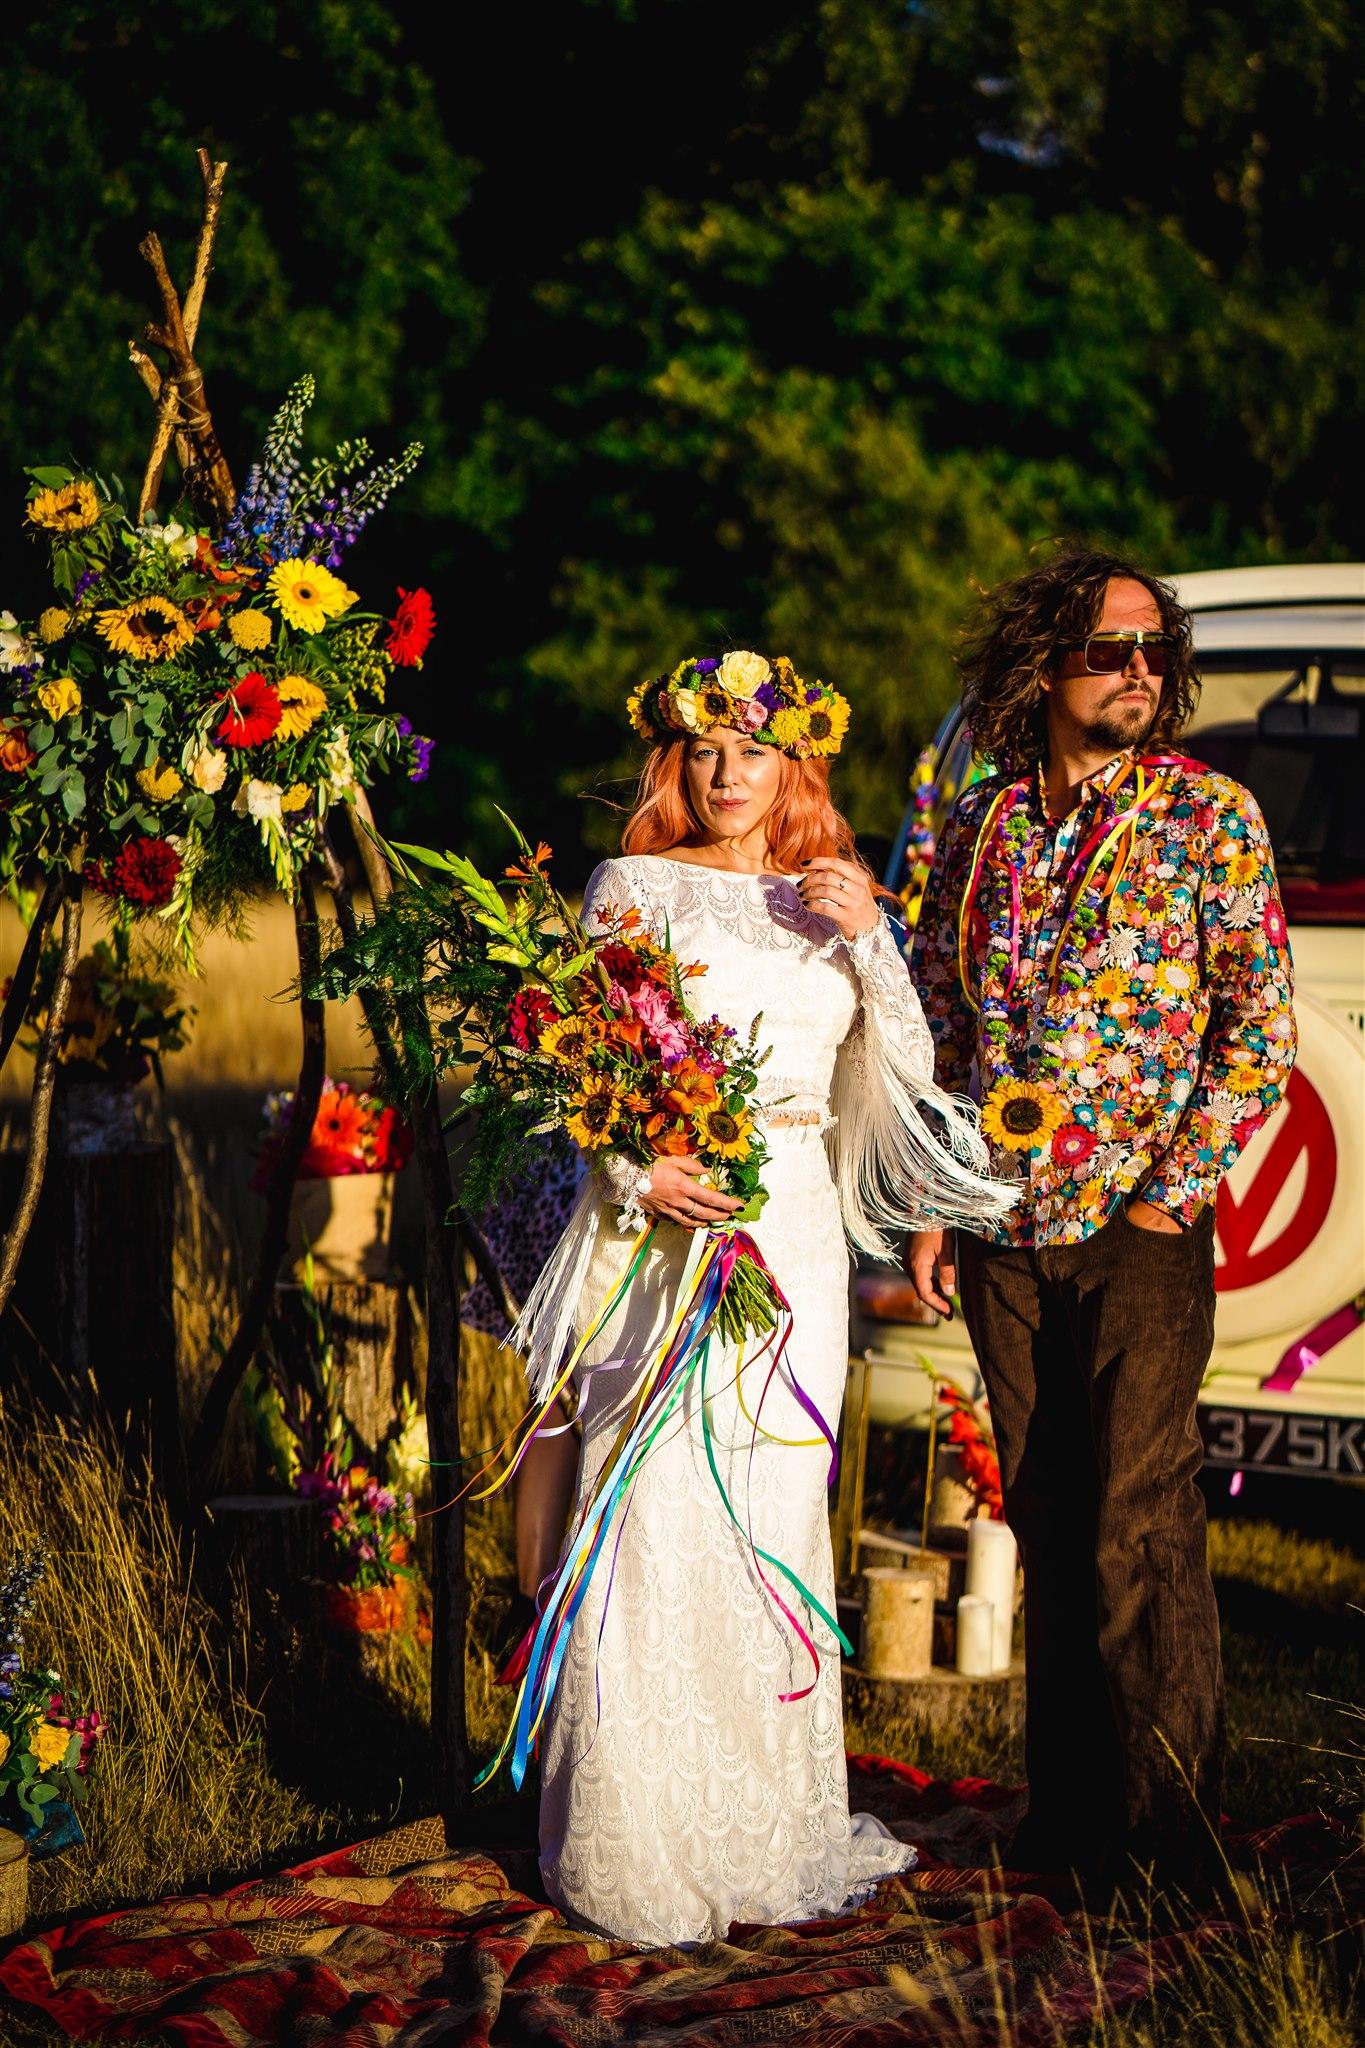 bohemian wedding styling - colourful bohemian wedding - 70s wedding - campervan wedding - hippie wedding - retro wedding